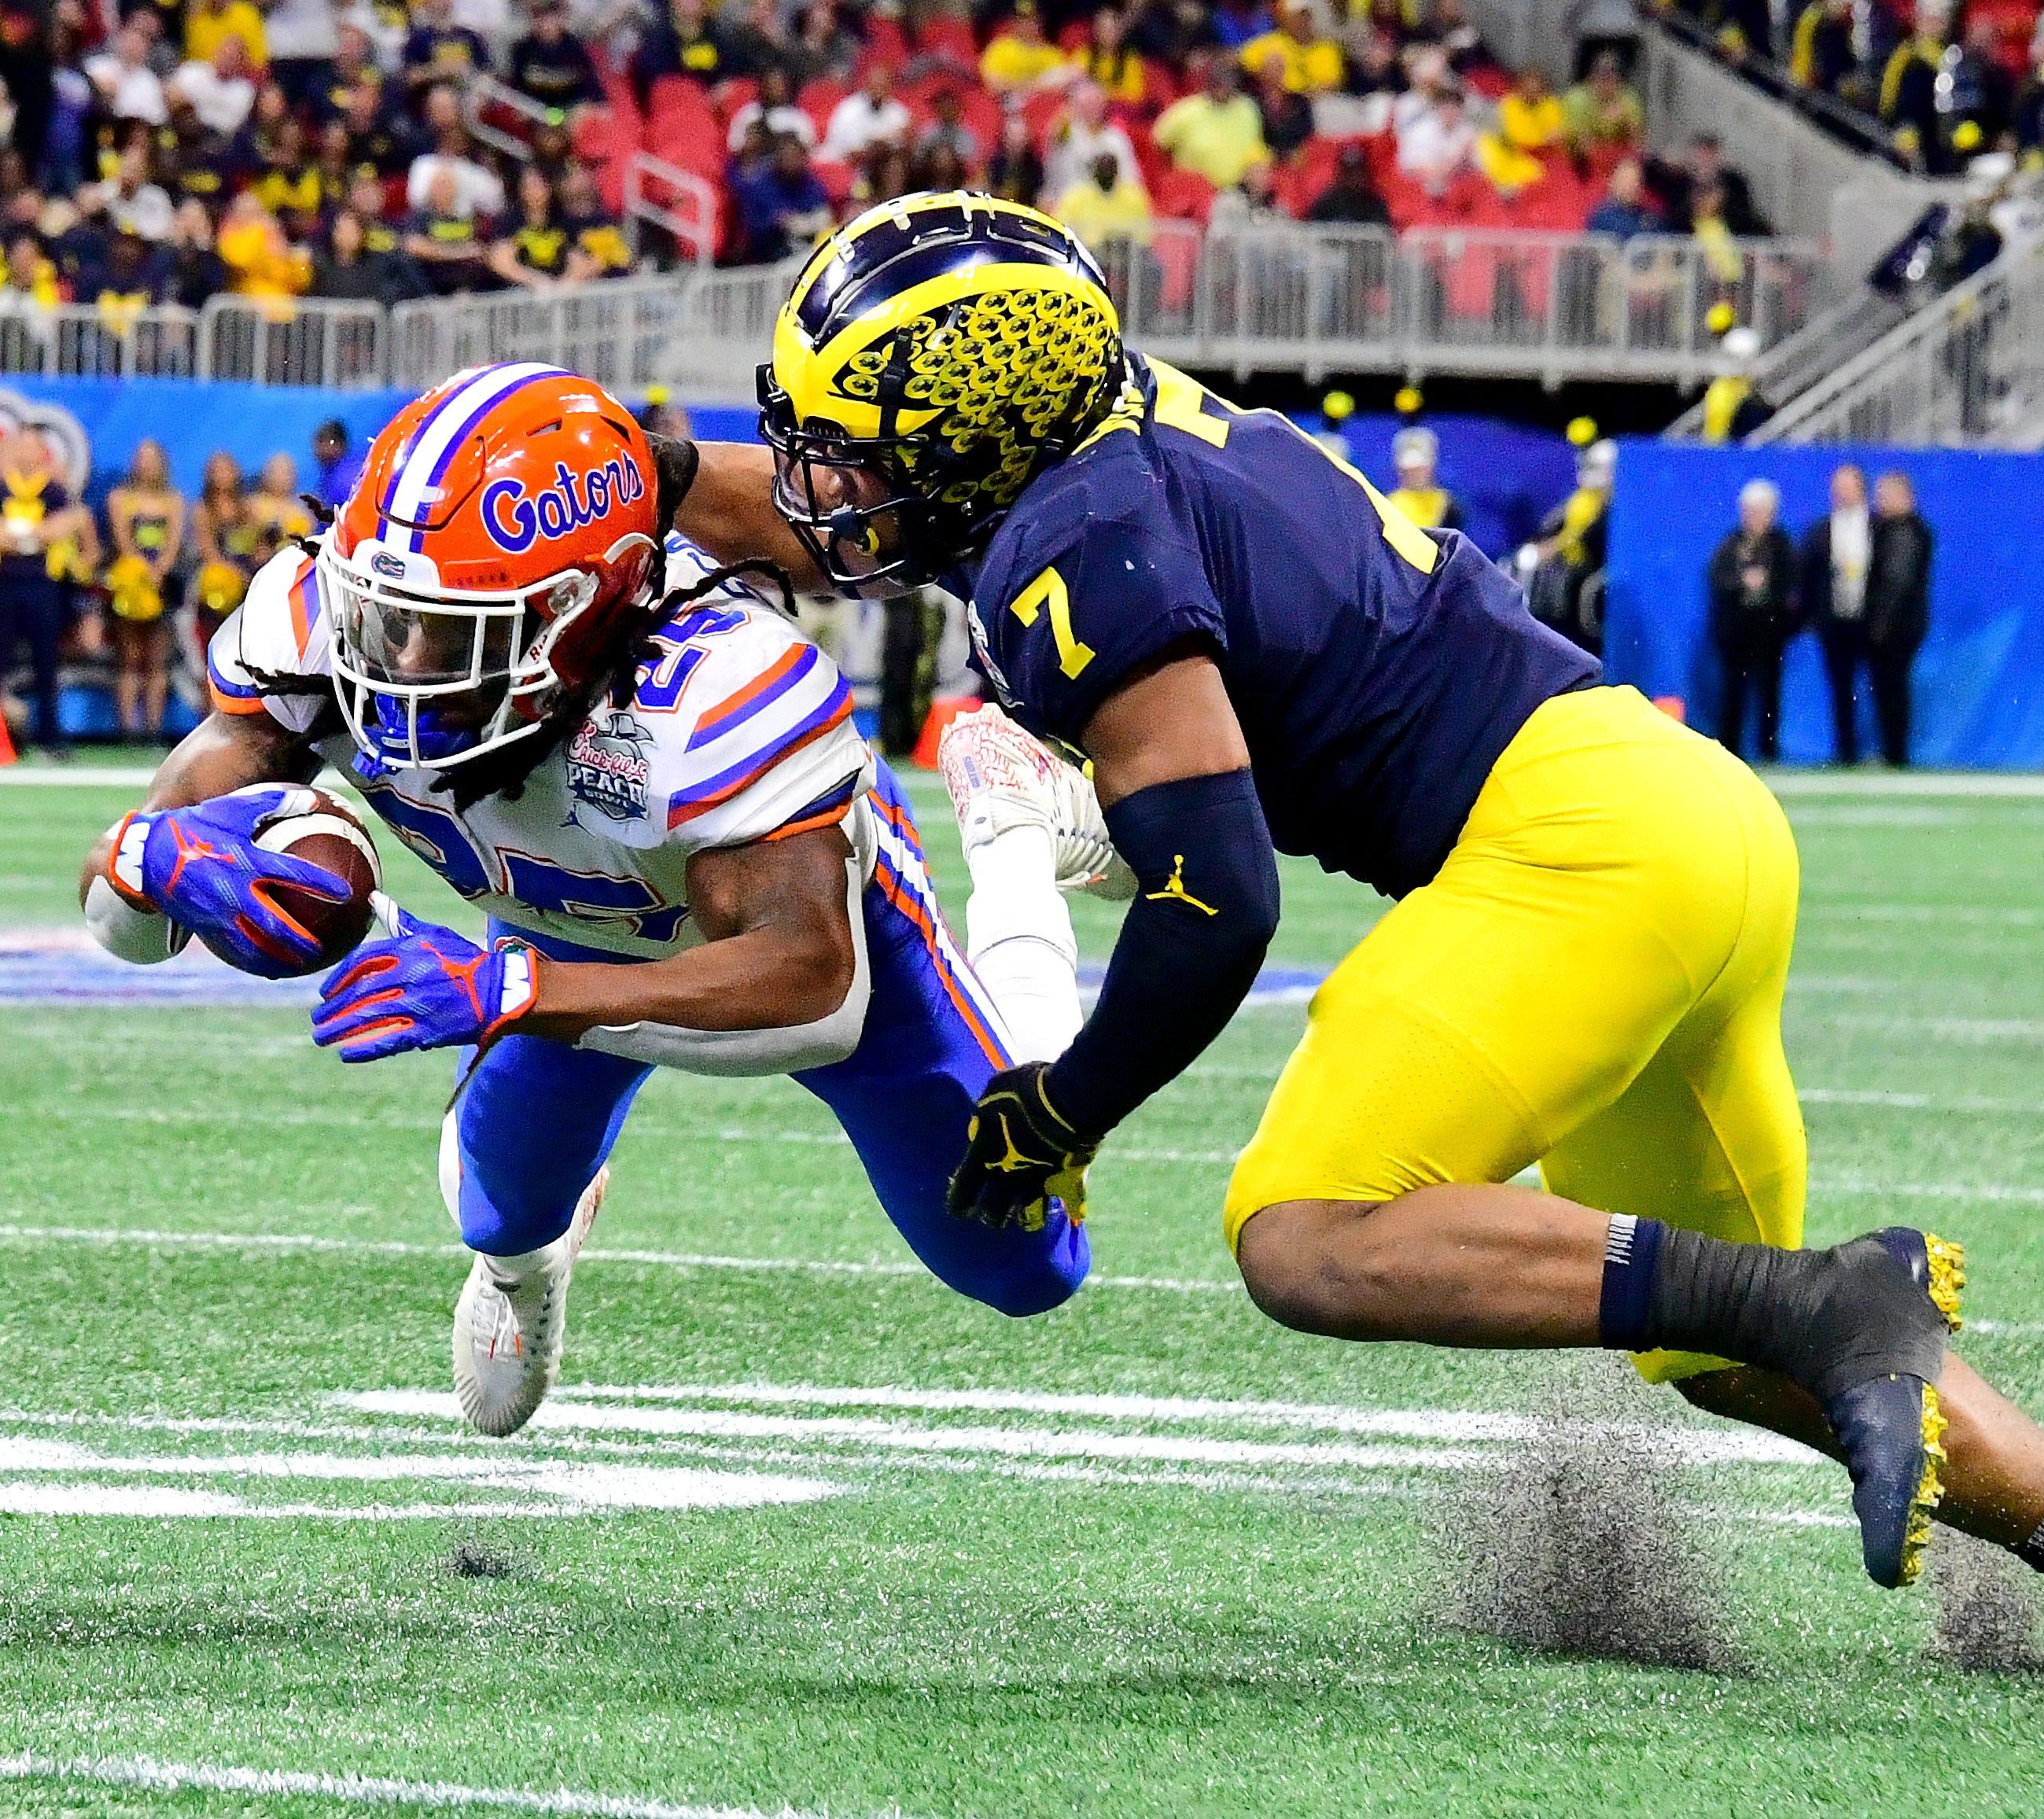 Michigan linebacker Khaleke Hudson makes a tackle in the Peach Bowl.